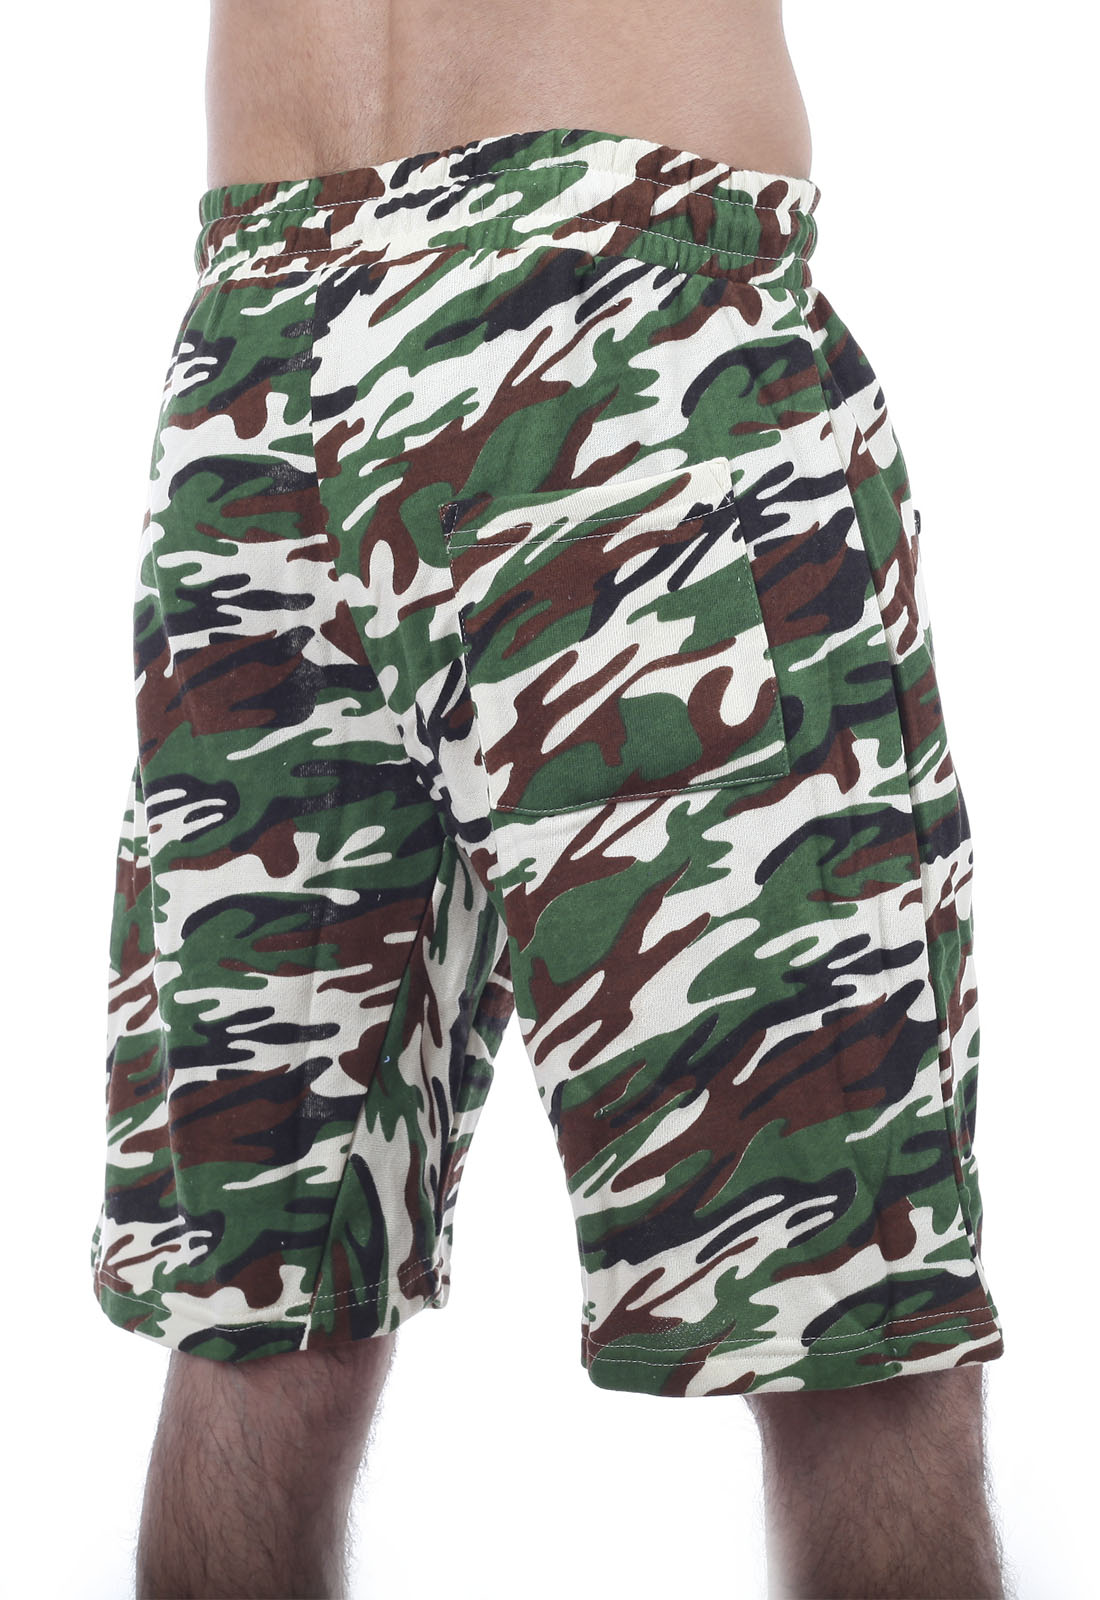 Недорогие армейские шорты с карманами